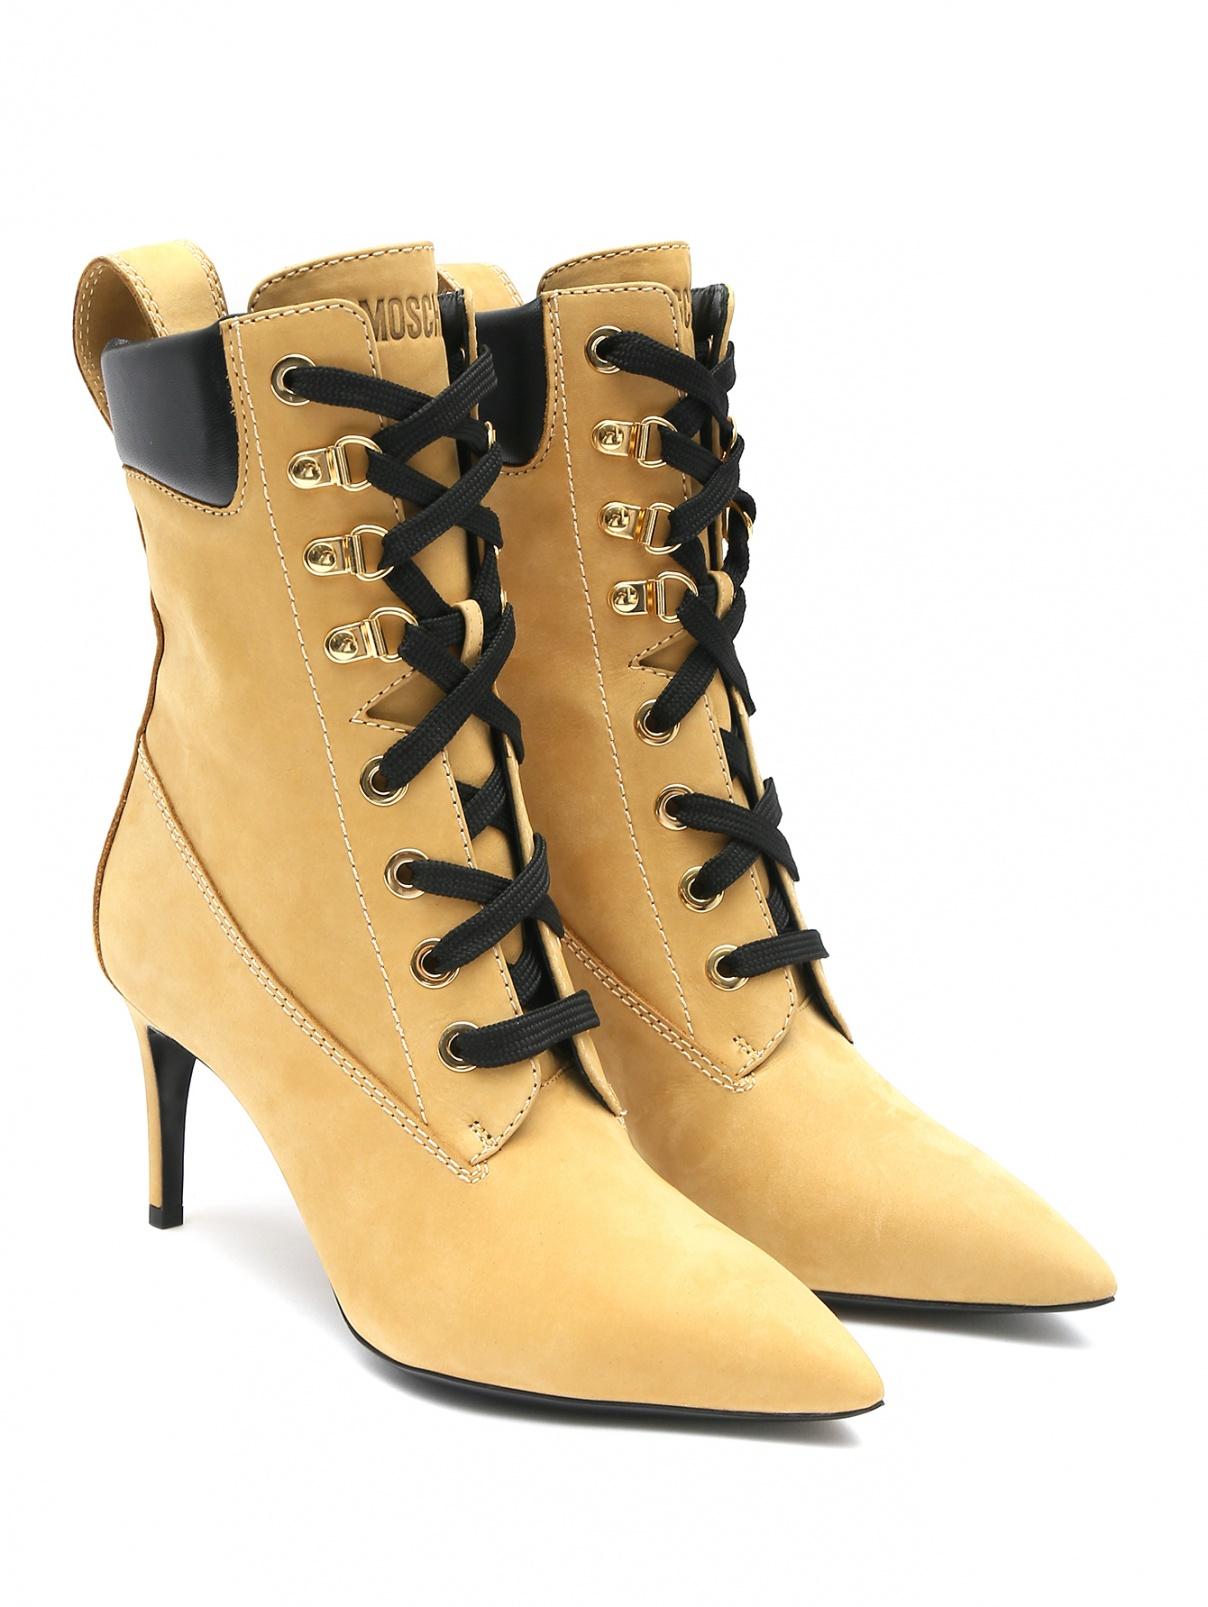 Ботильоны из кожи на шнурках Moschino  –  Общий вид